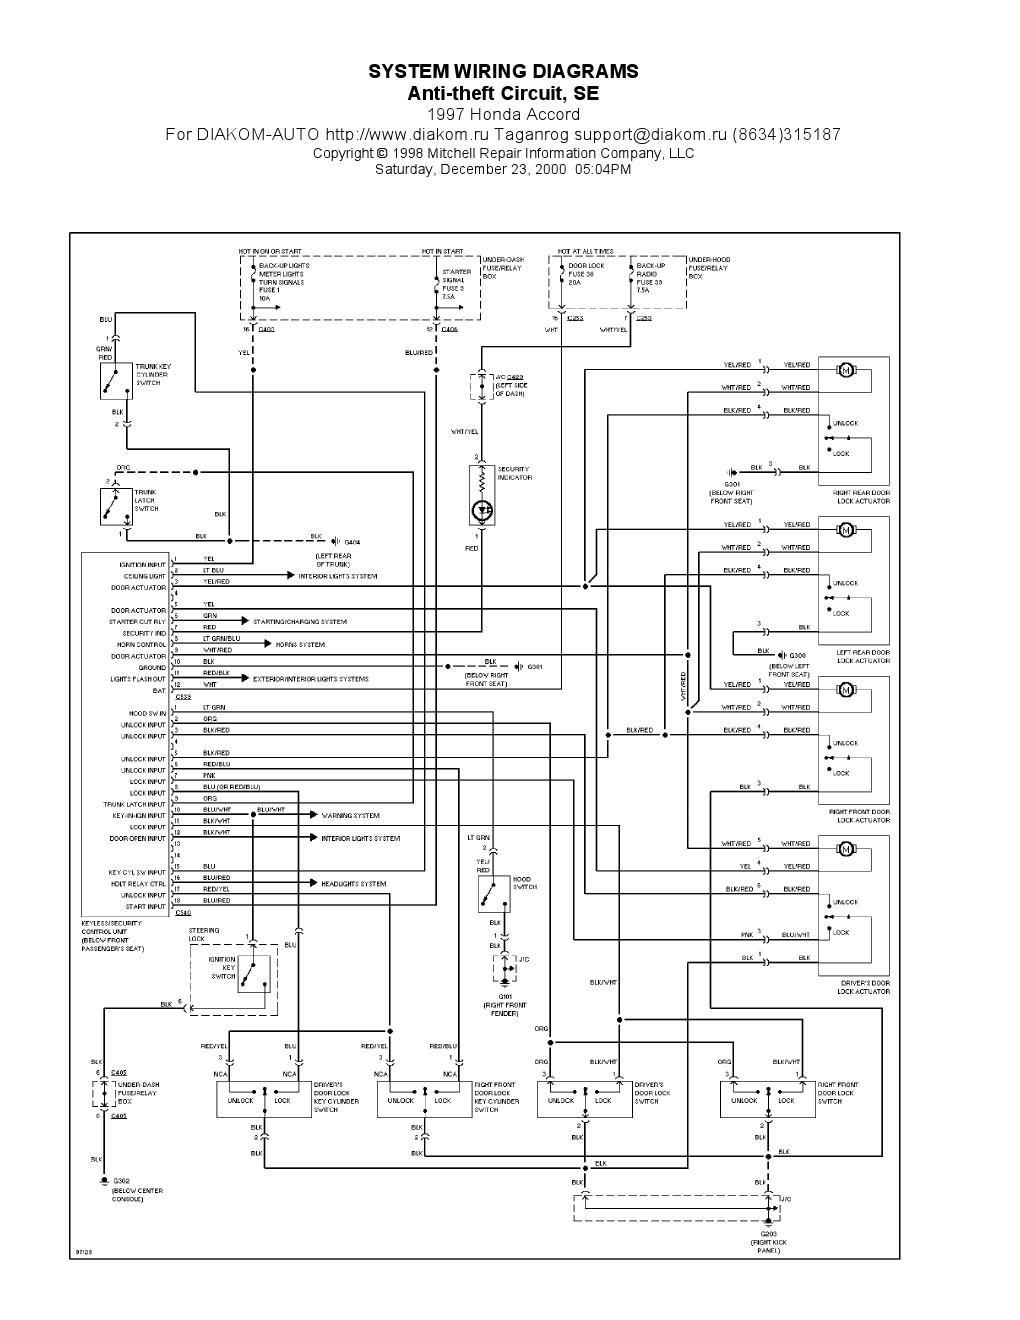 honda accord wiring diagrams home wiring diagram wiring diagram honda accord 2007 honda accord schematics wiring